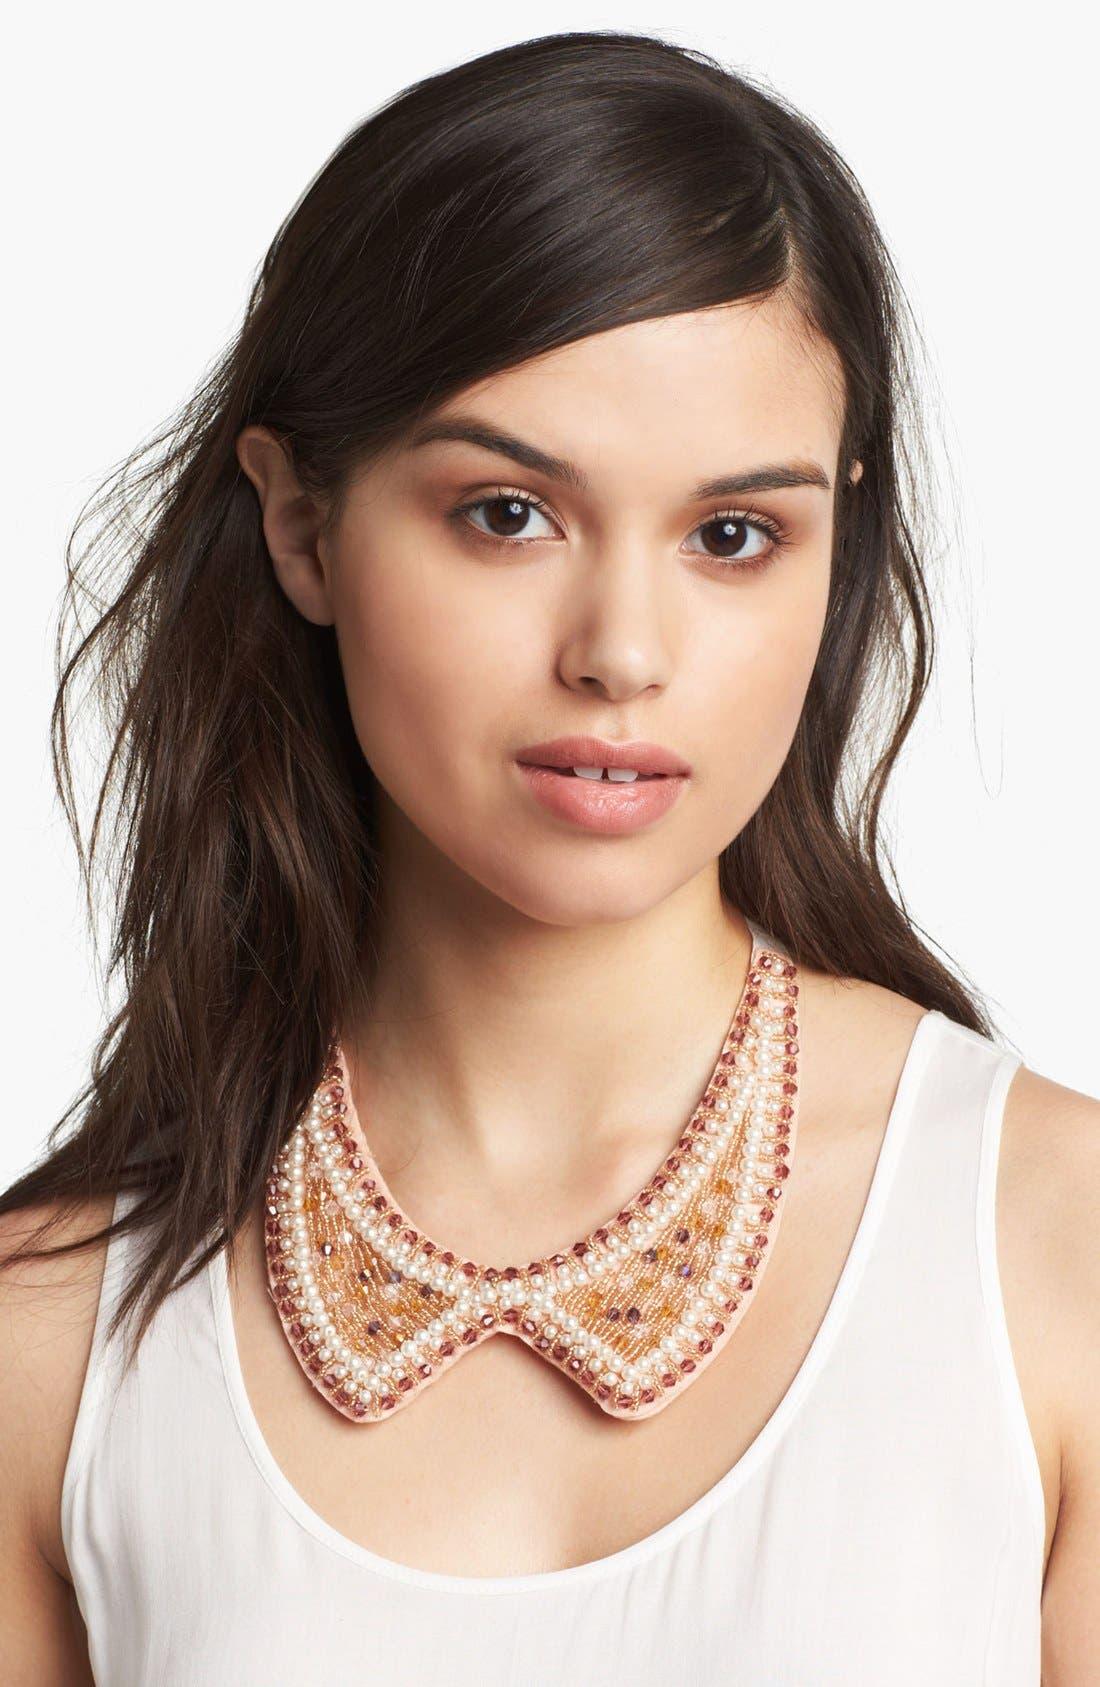 Alternate Image 1 Selected - Tasha 'Kitty Kat' Collar Necklace